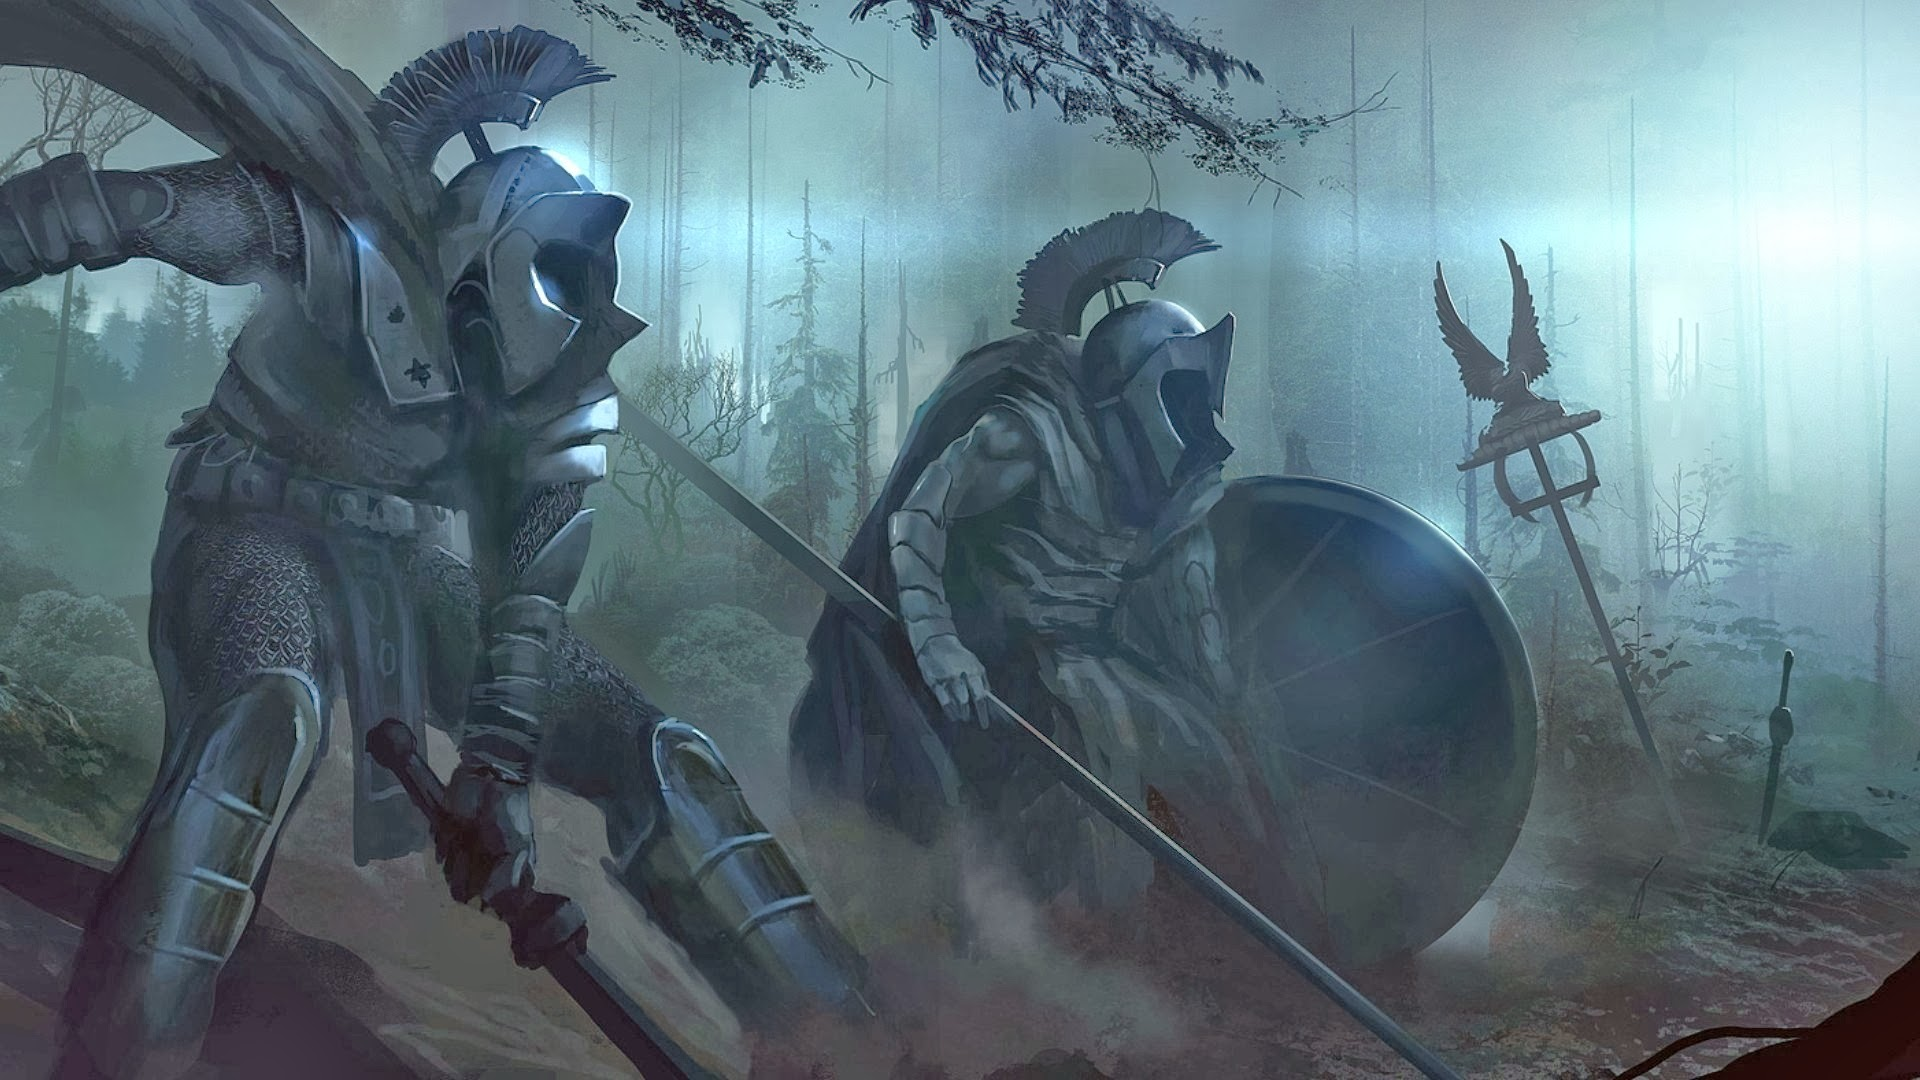 spartan warriors wallpaper hd soldier armor shield weapon fantasy 1920 1920x1080